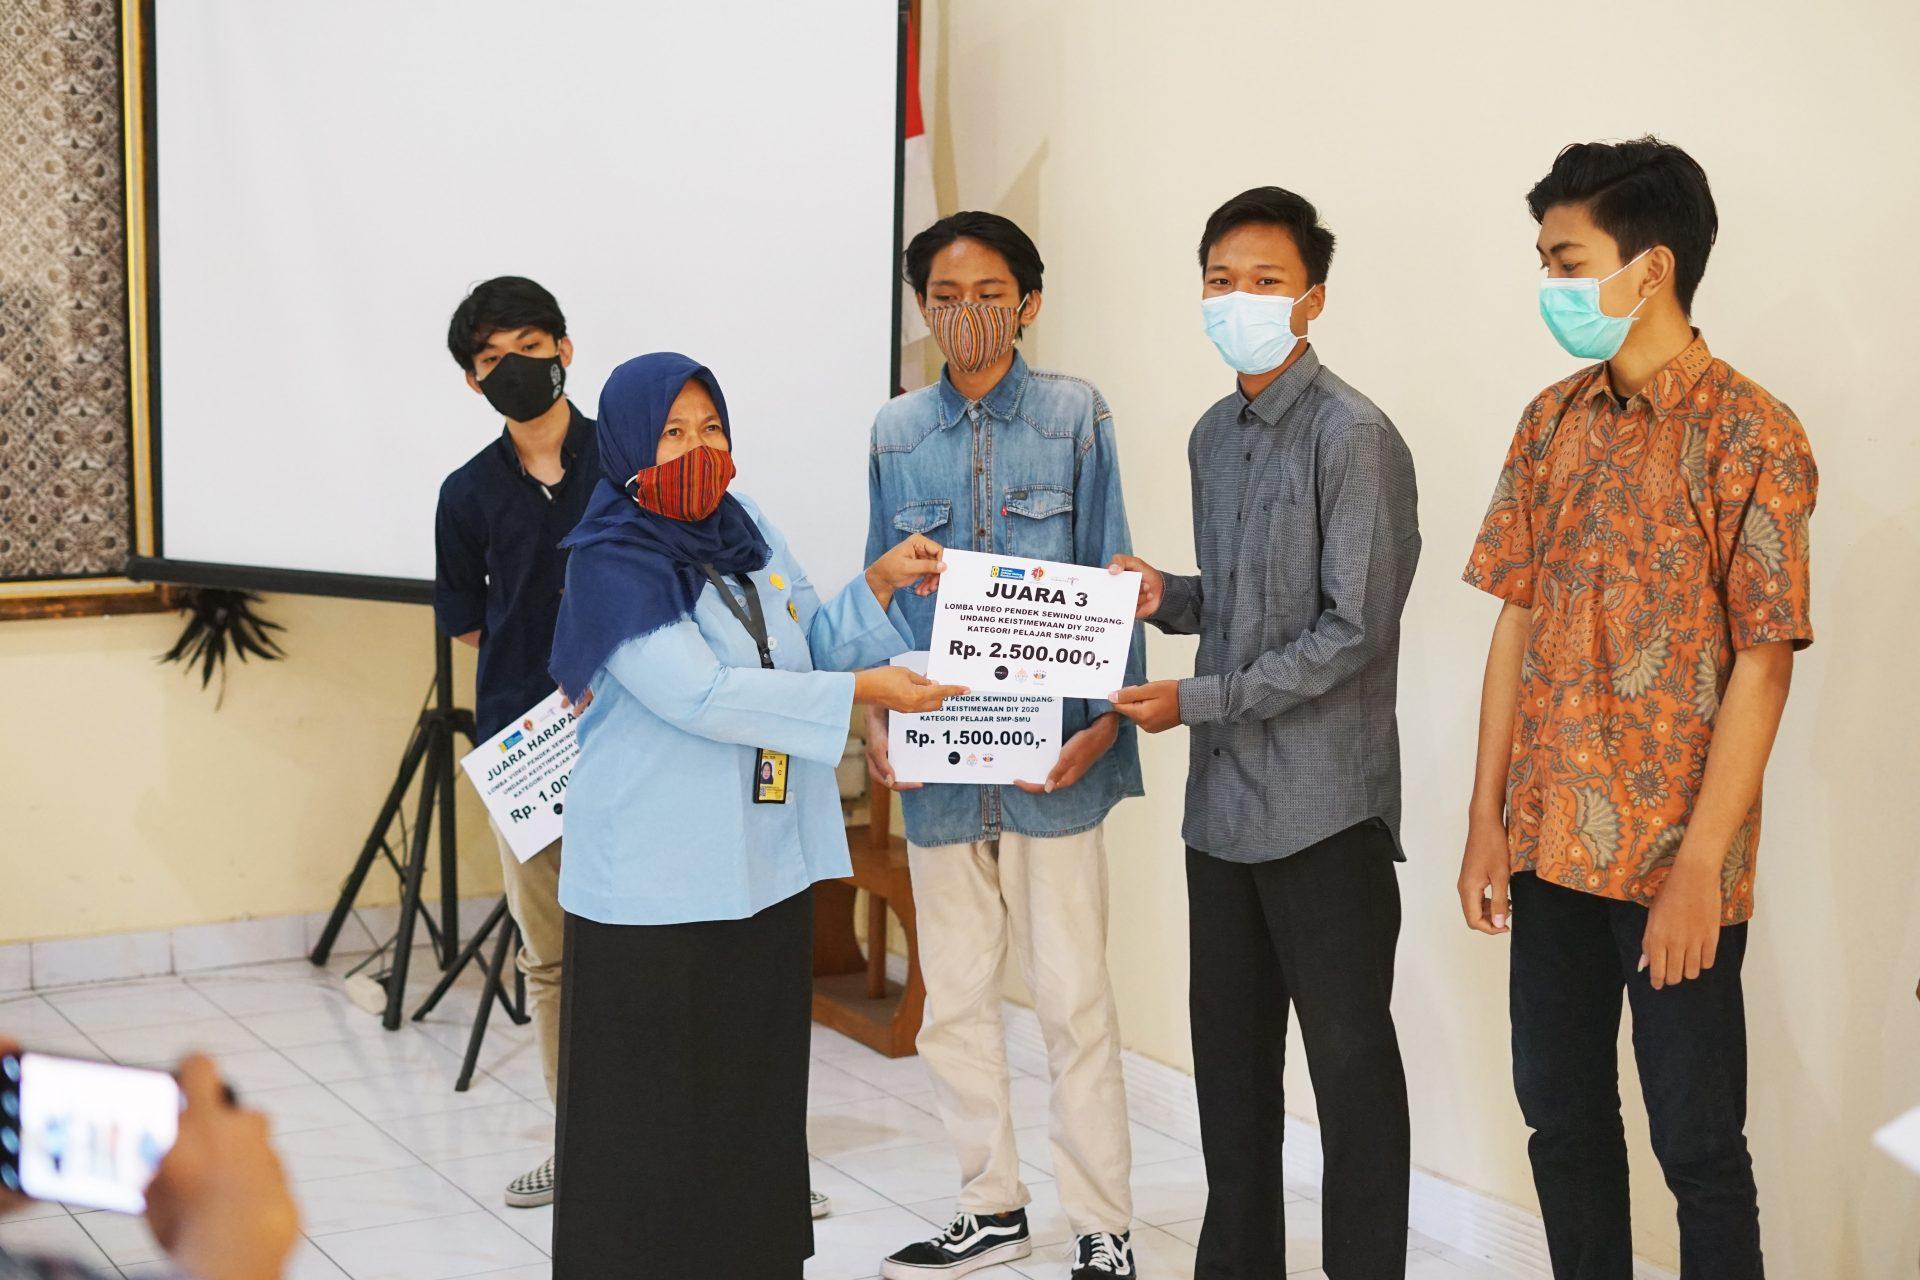 Raih Kejuraan Videografi, Nizar Falah si Cabe Rawit Berprestasi